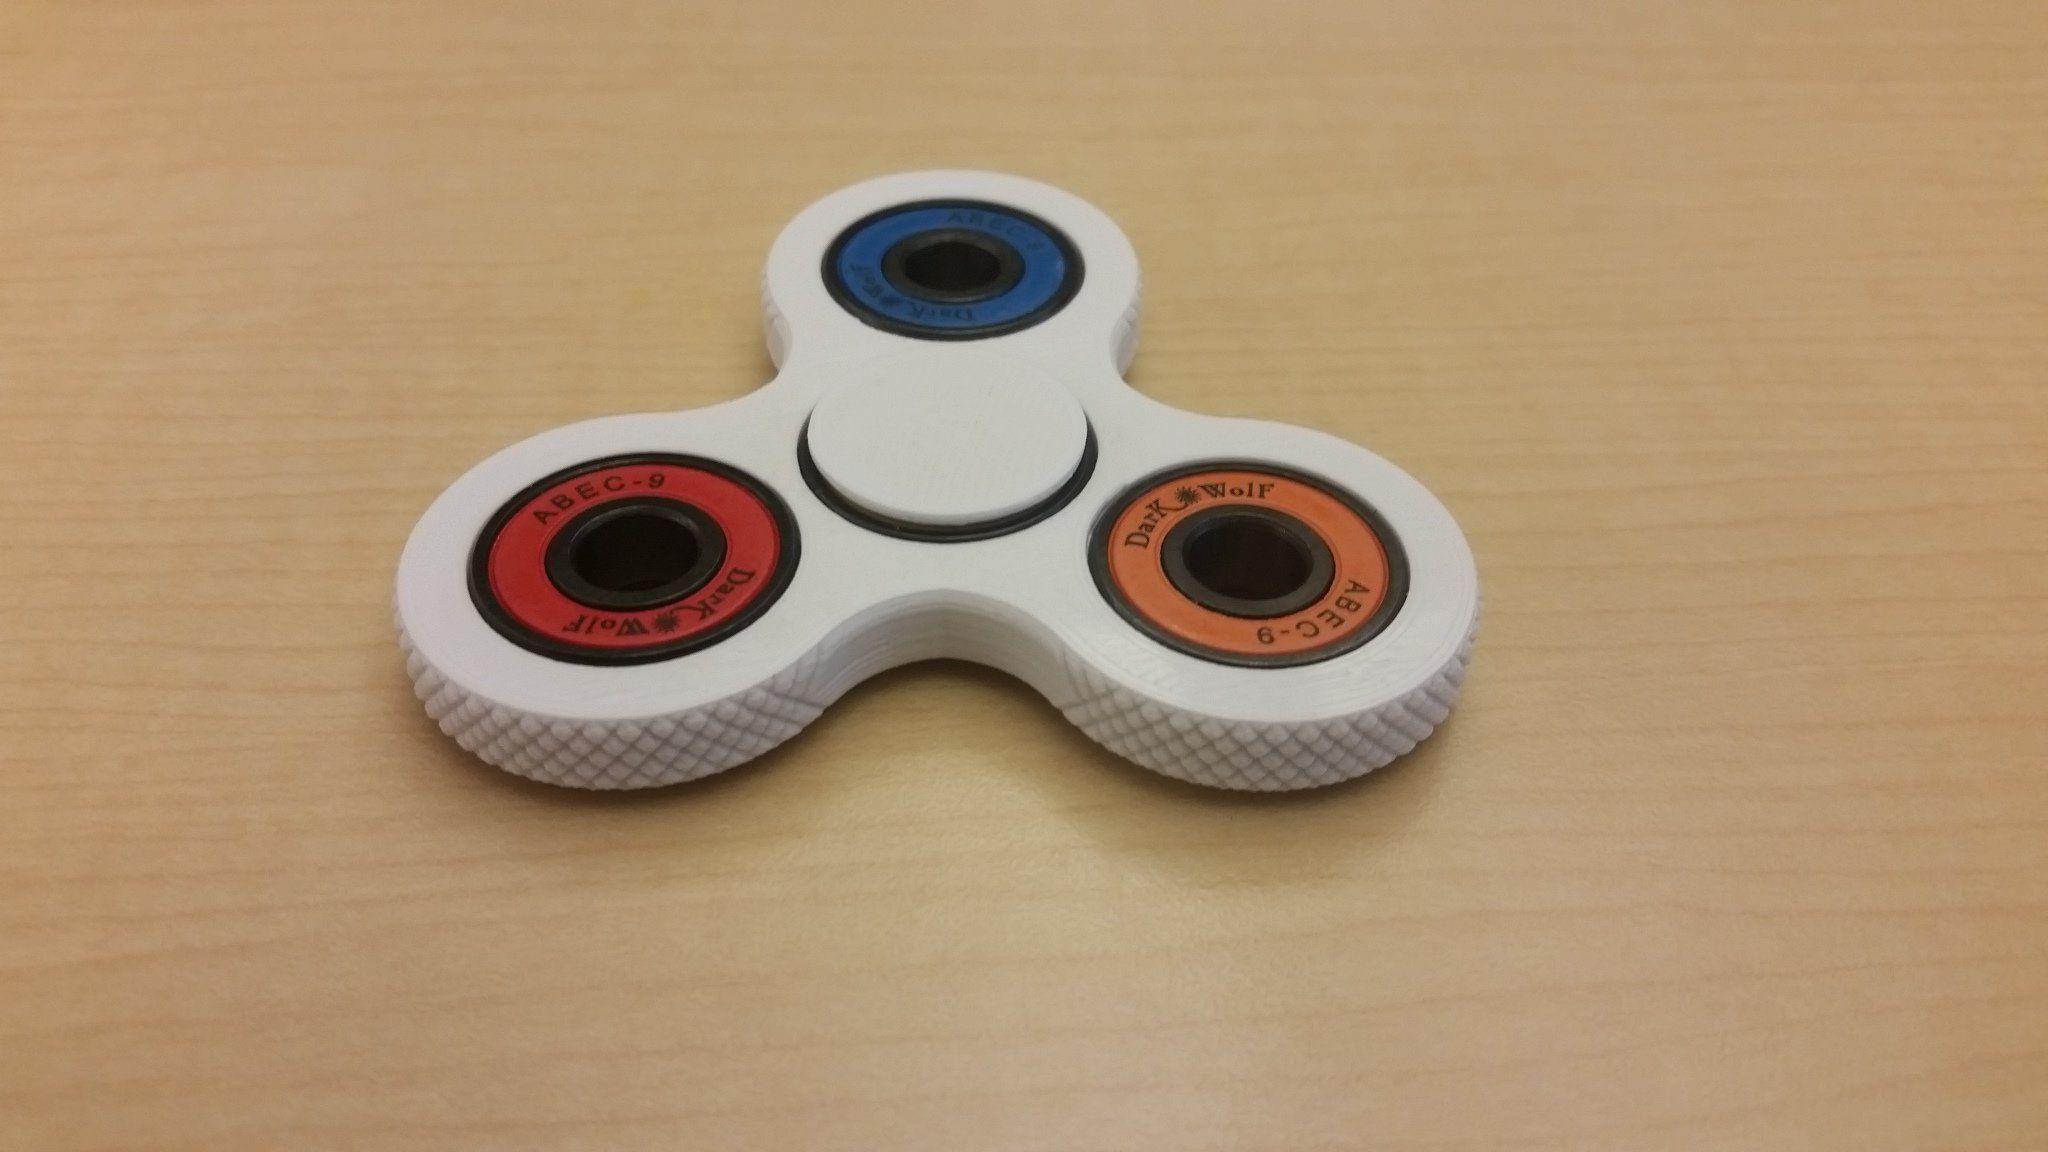 Download Free 15 Fidget Spinner Wallpapers Fidget Spinner Free Hd Wallpapers Fidgets